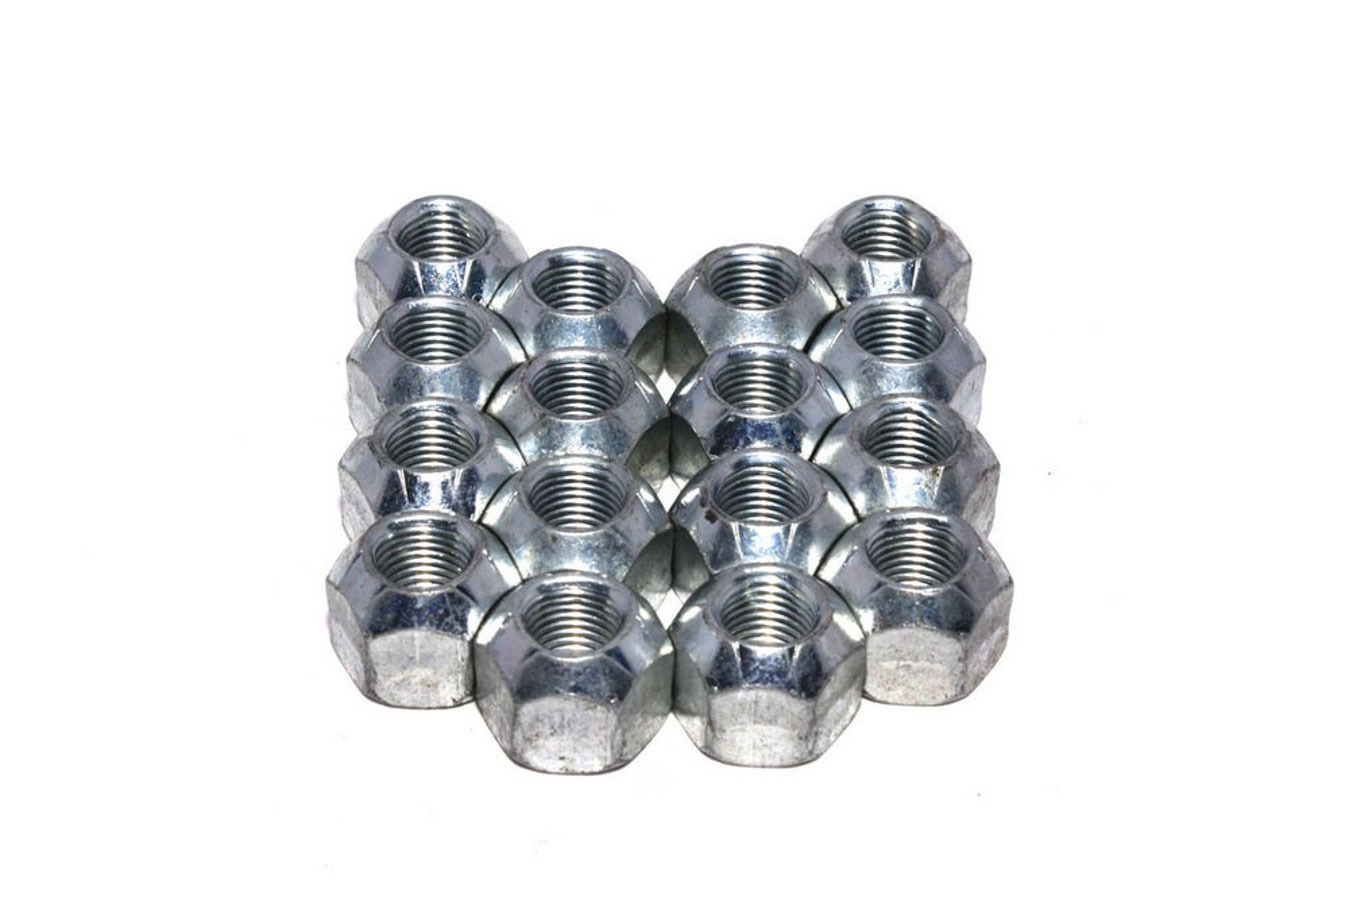 Comp Cams 1401N-16 Rocker Arm Nut, Magnum, 7/16-20 in Thread, Steel, Zinc Oxide, Set of 16